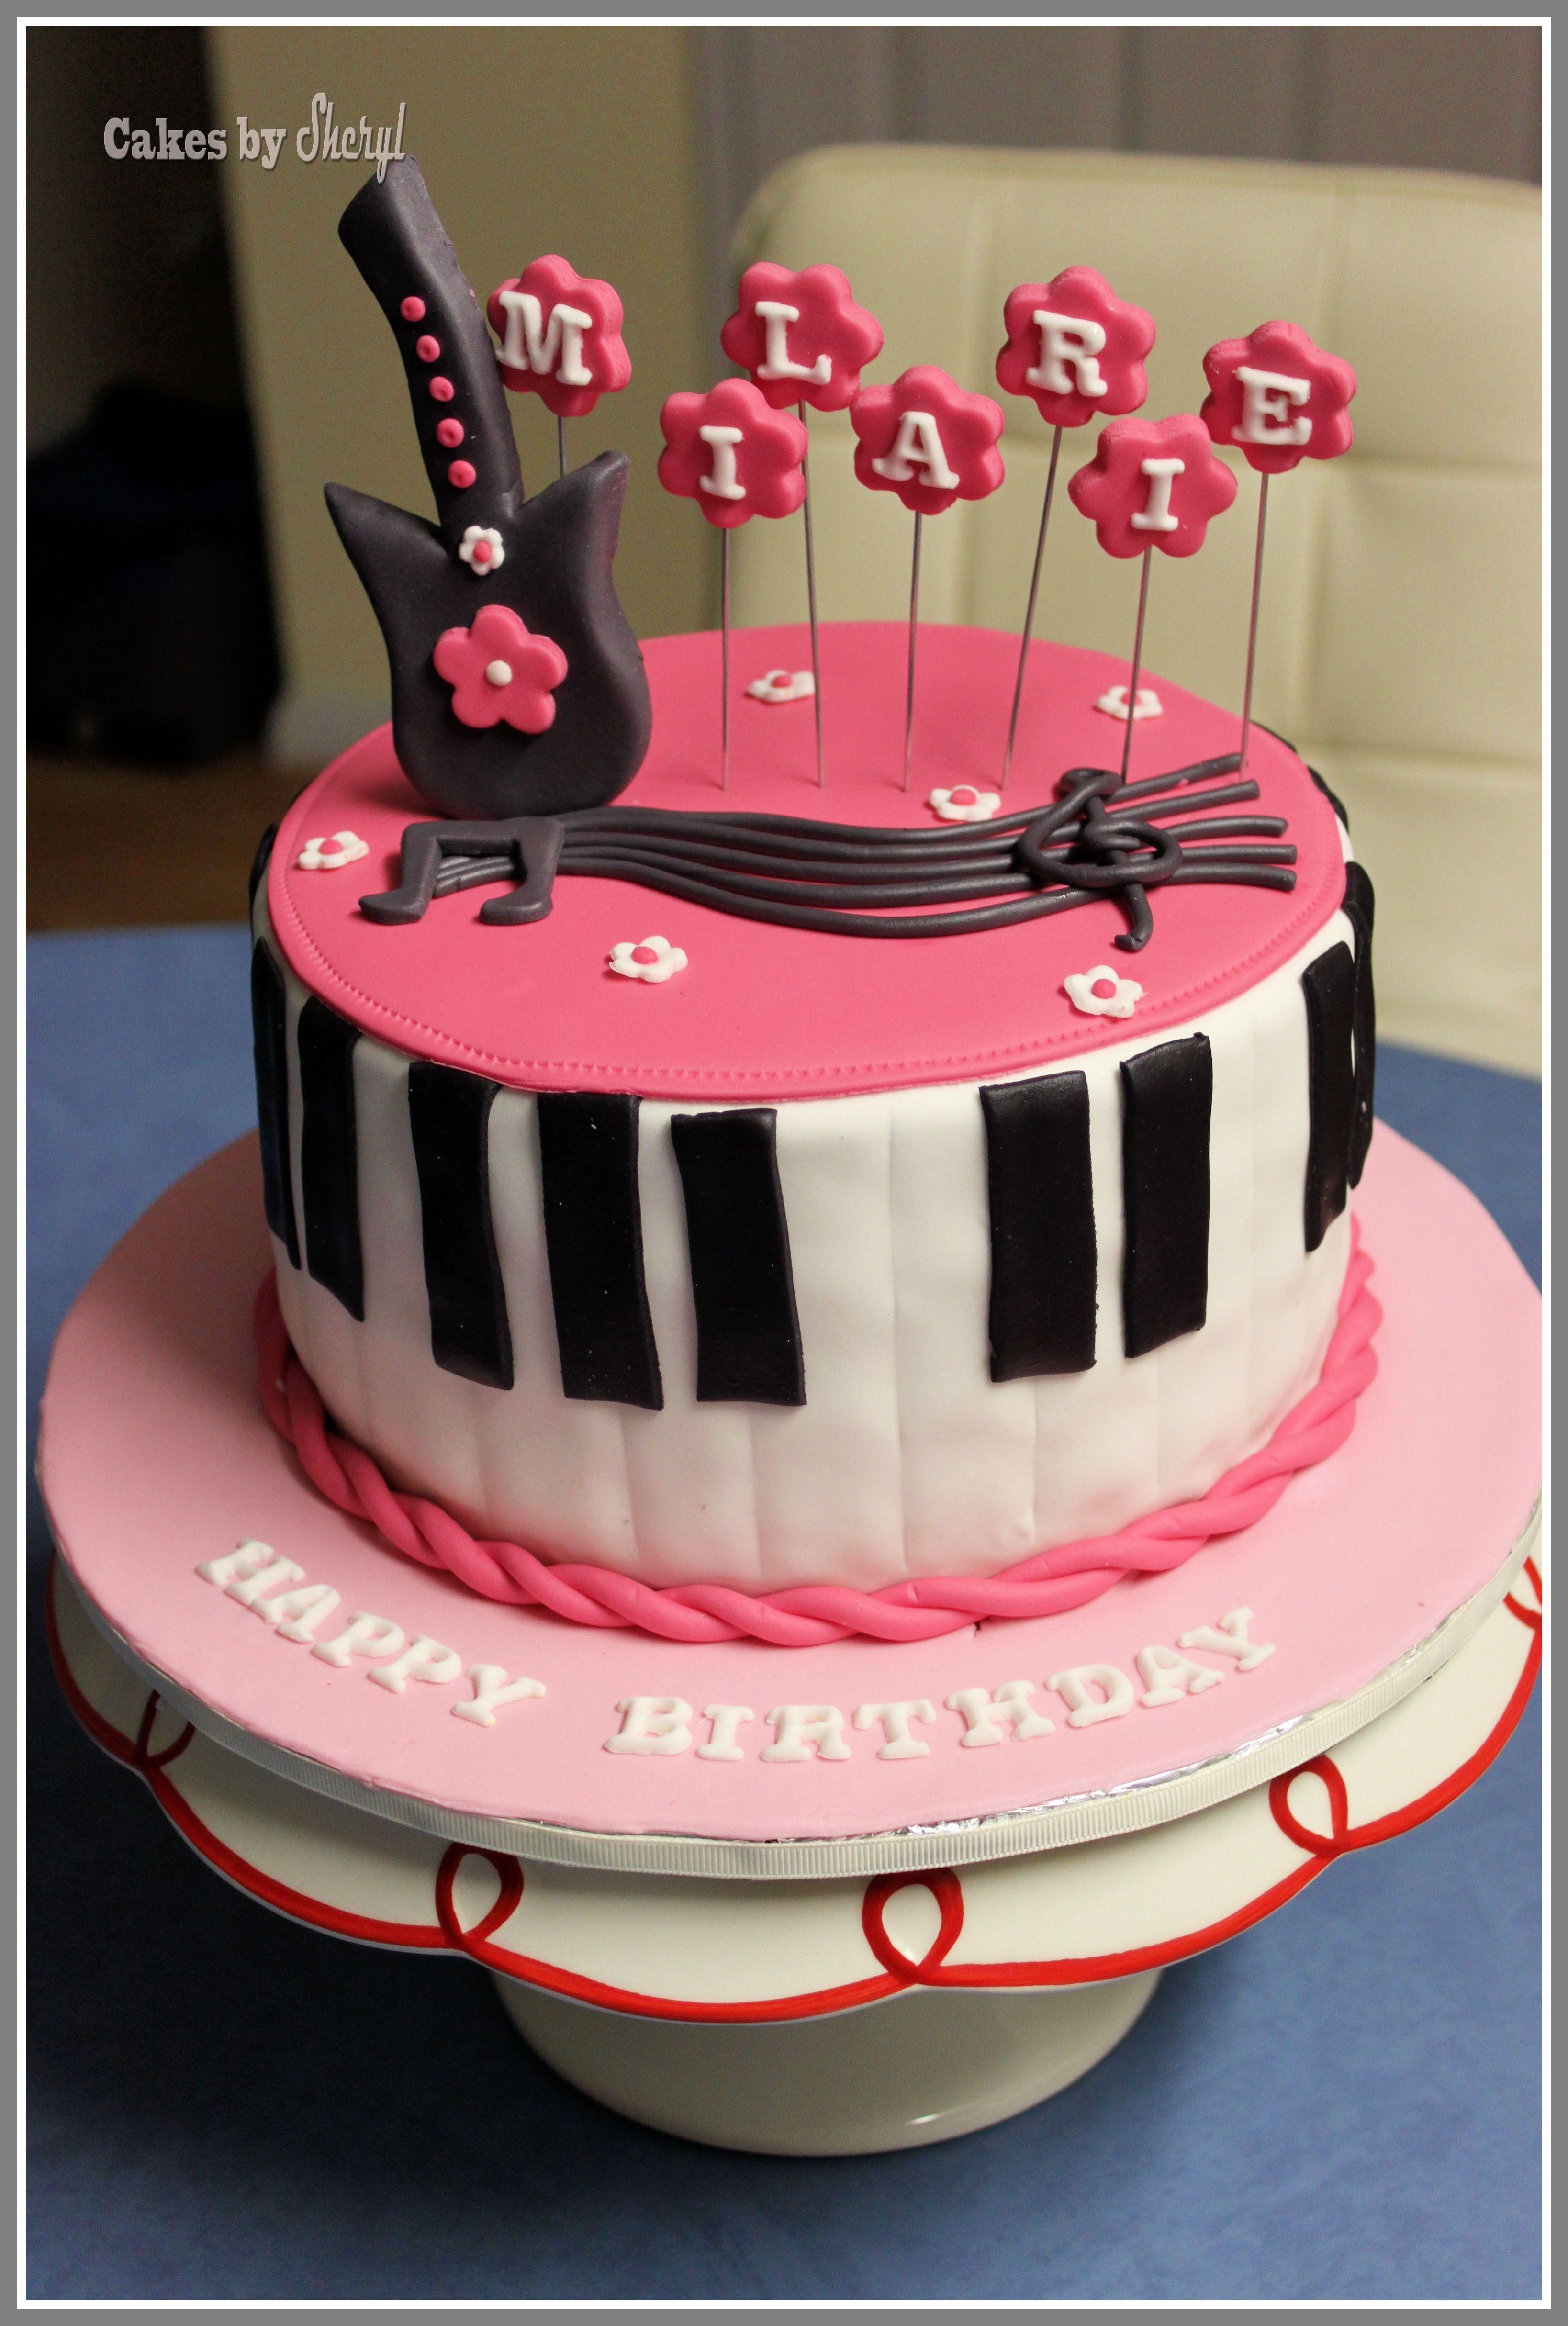 Music themed cake | Themed cakes, Music themed cakes, Cake